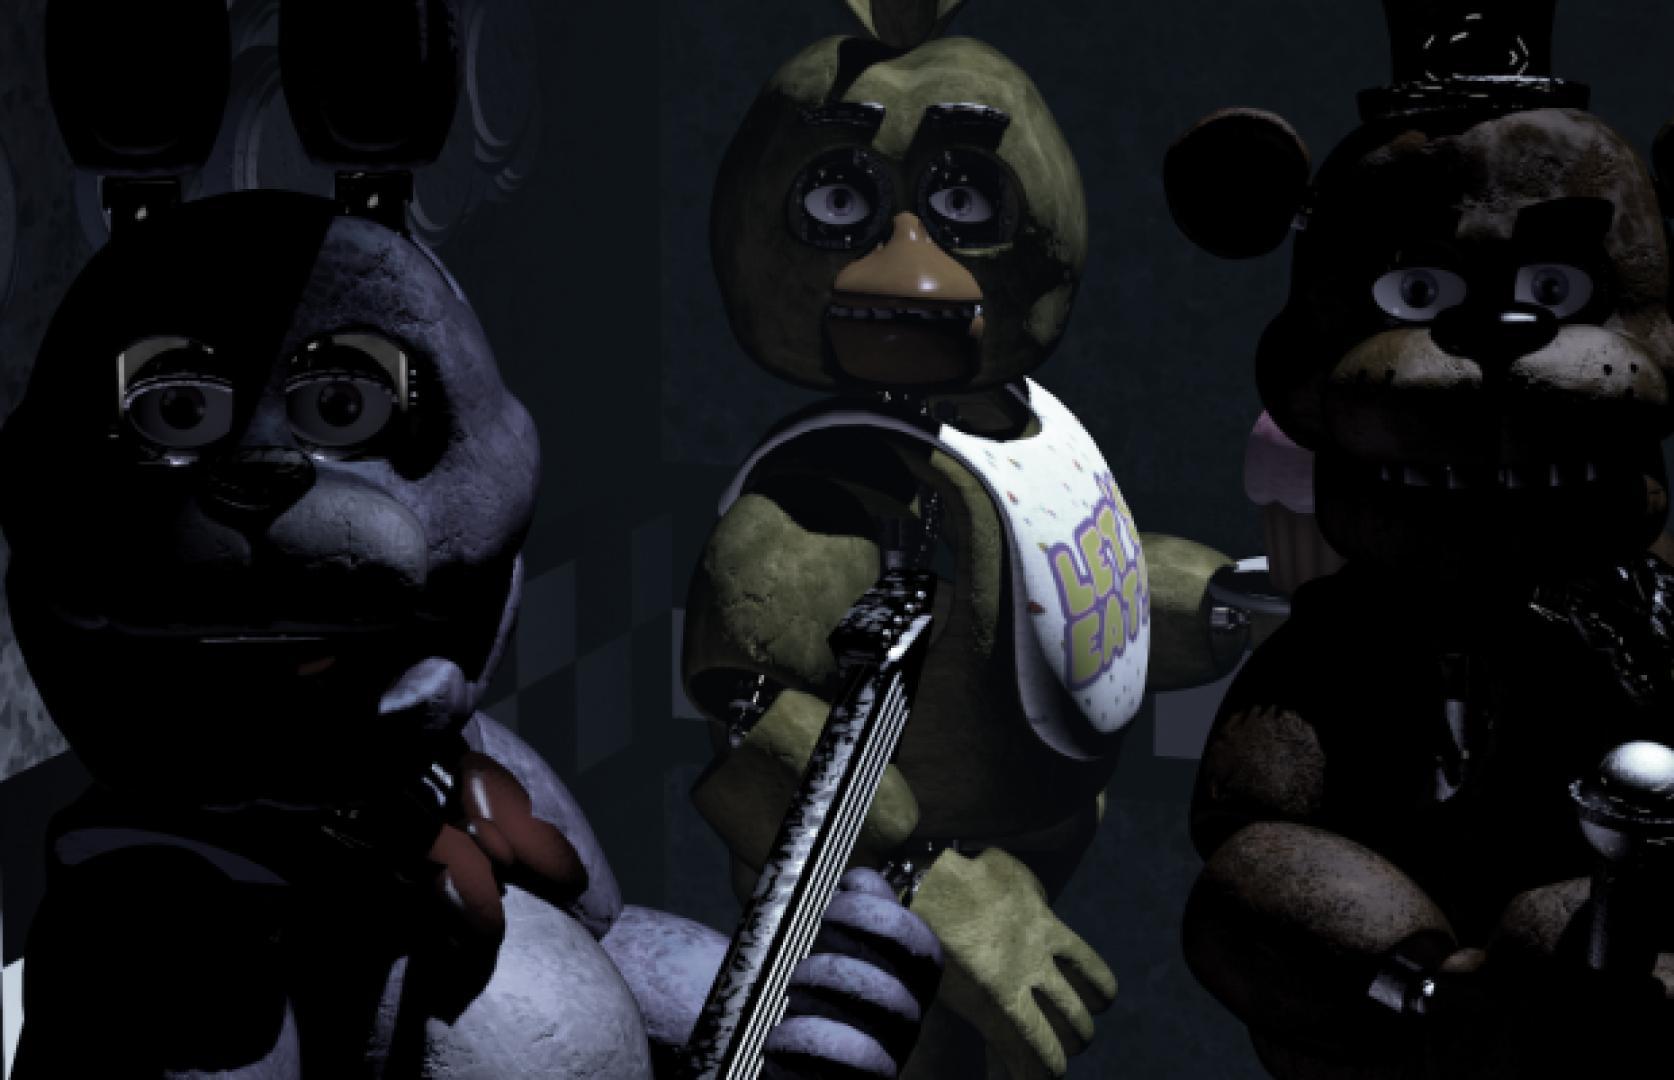 Gil Kenan rendezi a Five Nights at Freddy's filmet